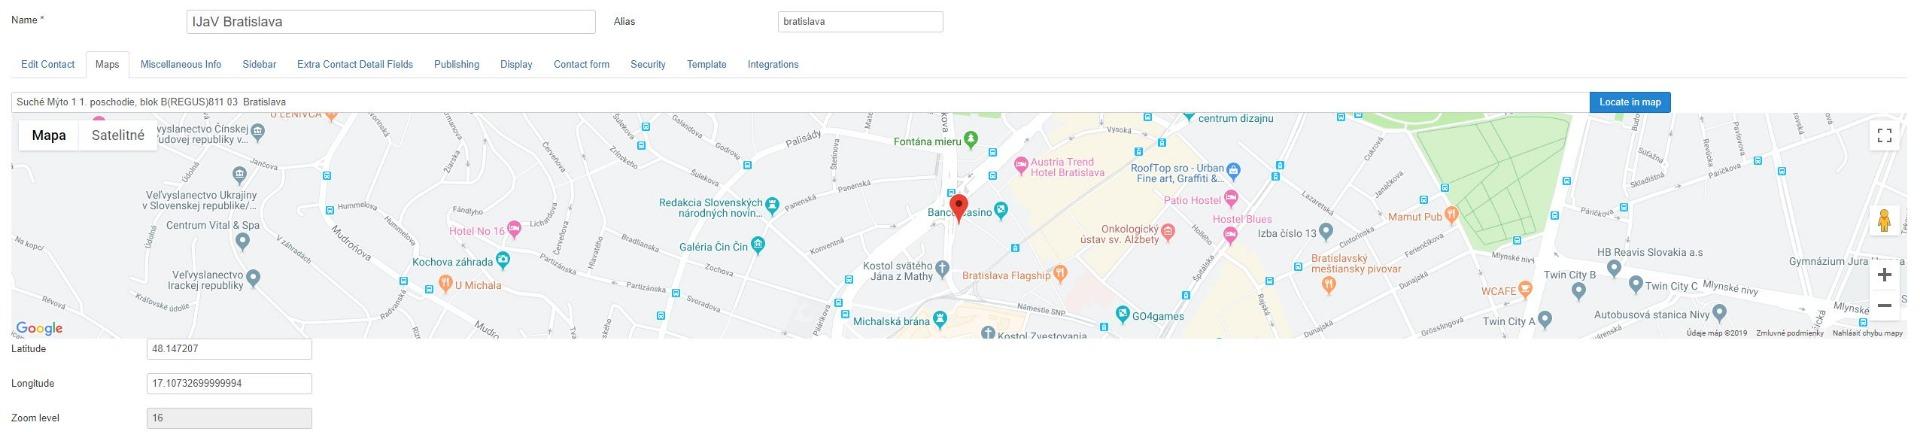 ce_contact_map.jpg